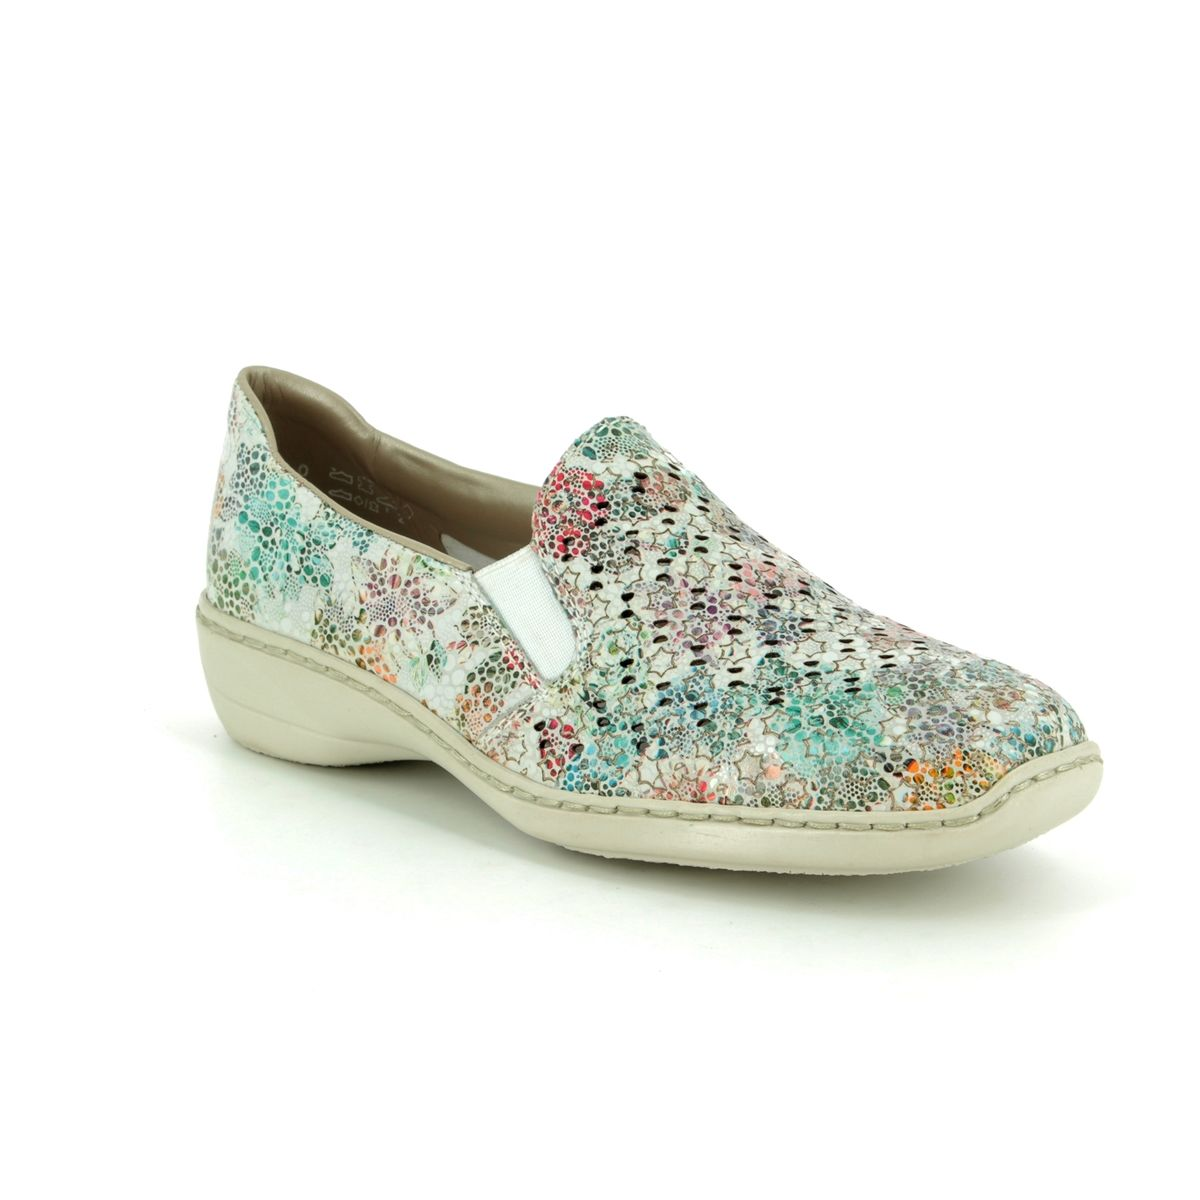 heiße Produkte professionelle Website offizielle Bilder 413q6-90 Doristar at Begg Shoes & Bags